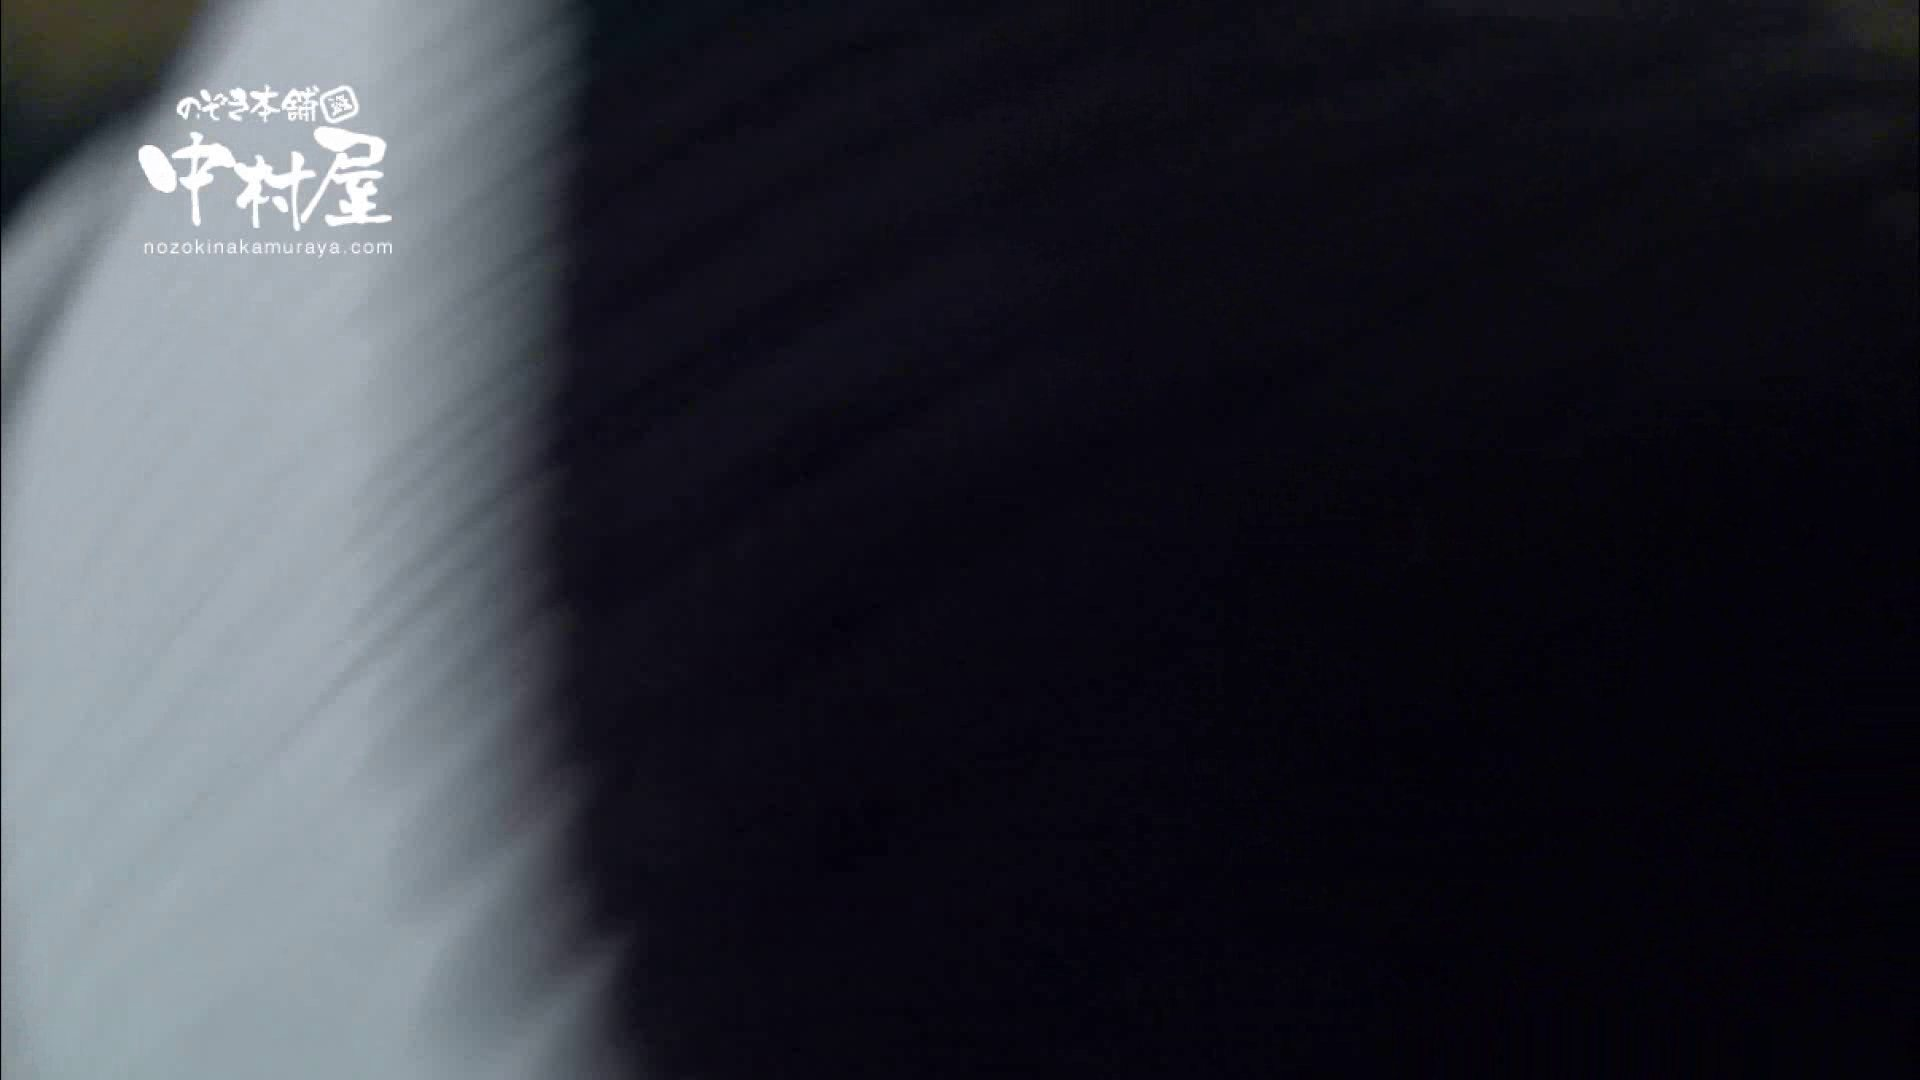 鬼畜 vol.03 イヤァー! 前編 鬼畜 | 0  79画像 52